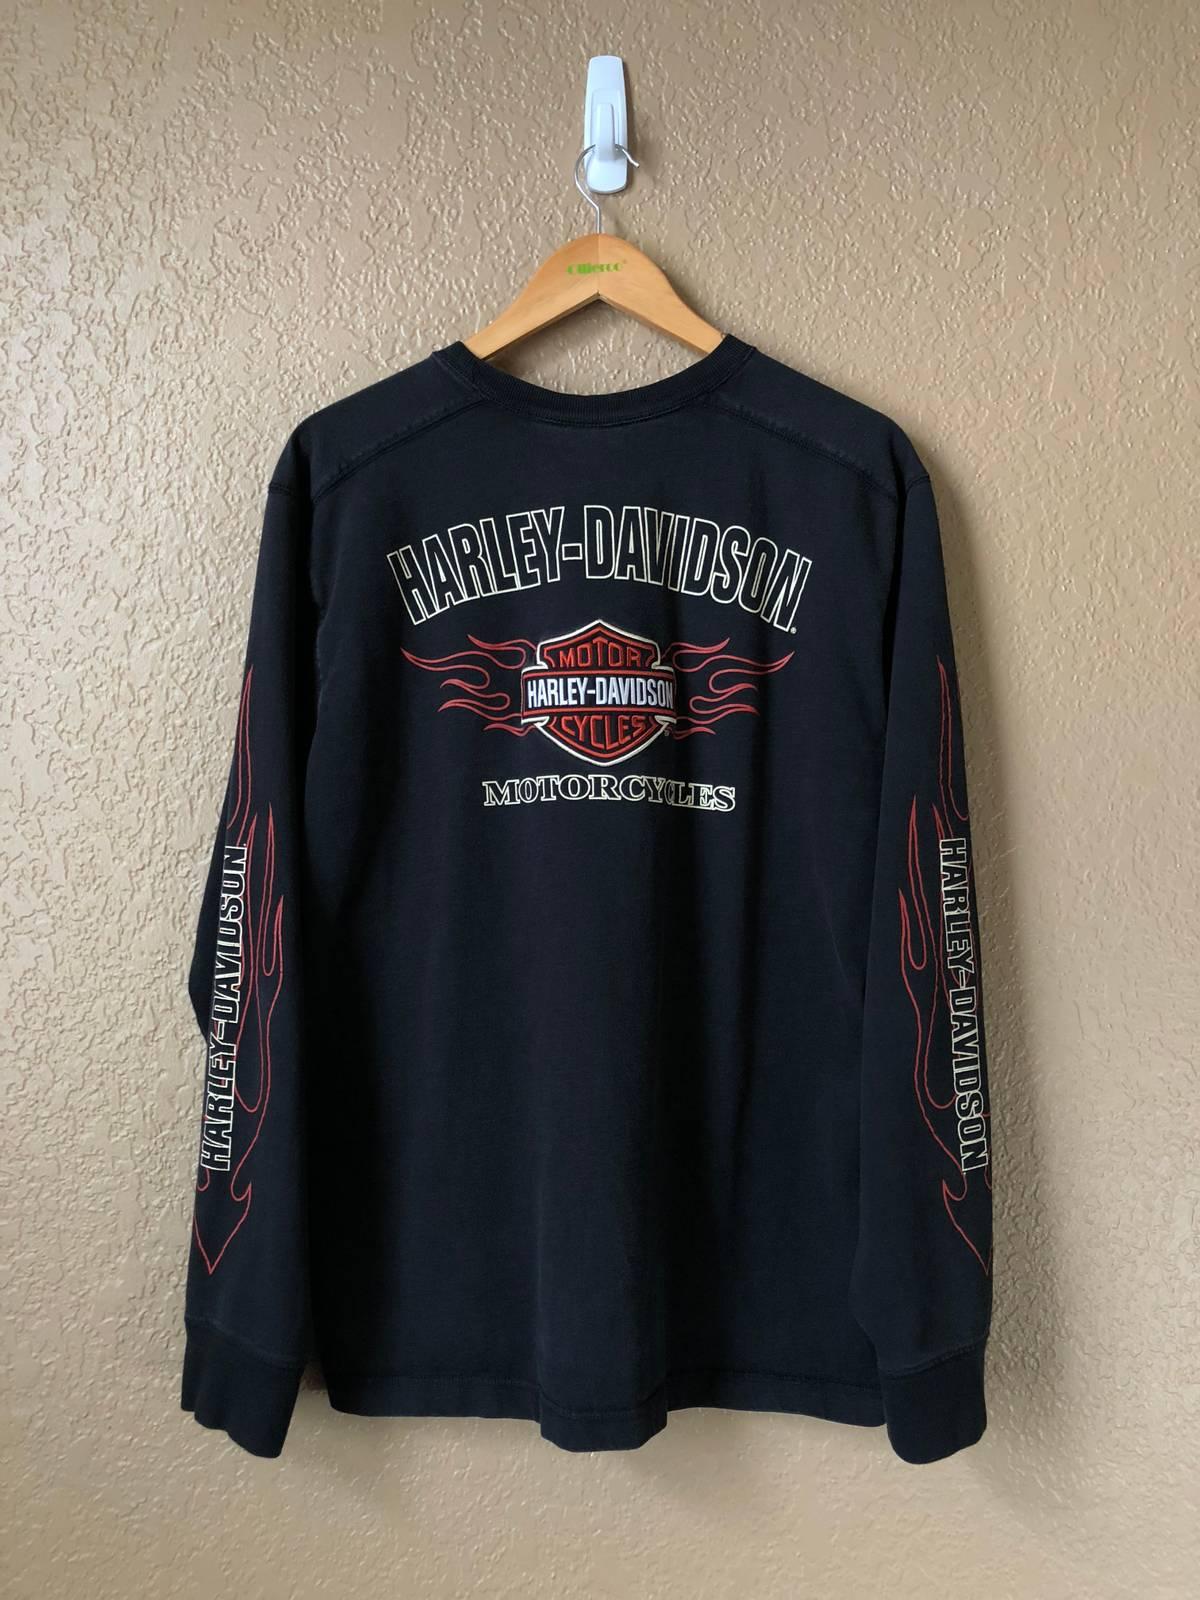 Vintage HARLEY DAVIDSON Motorcycle Flame Fire T Shirt Logo Art Fashion